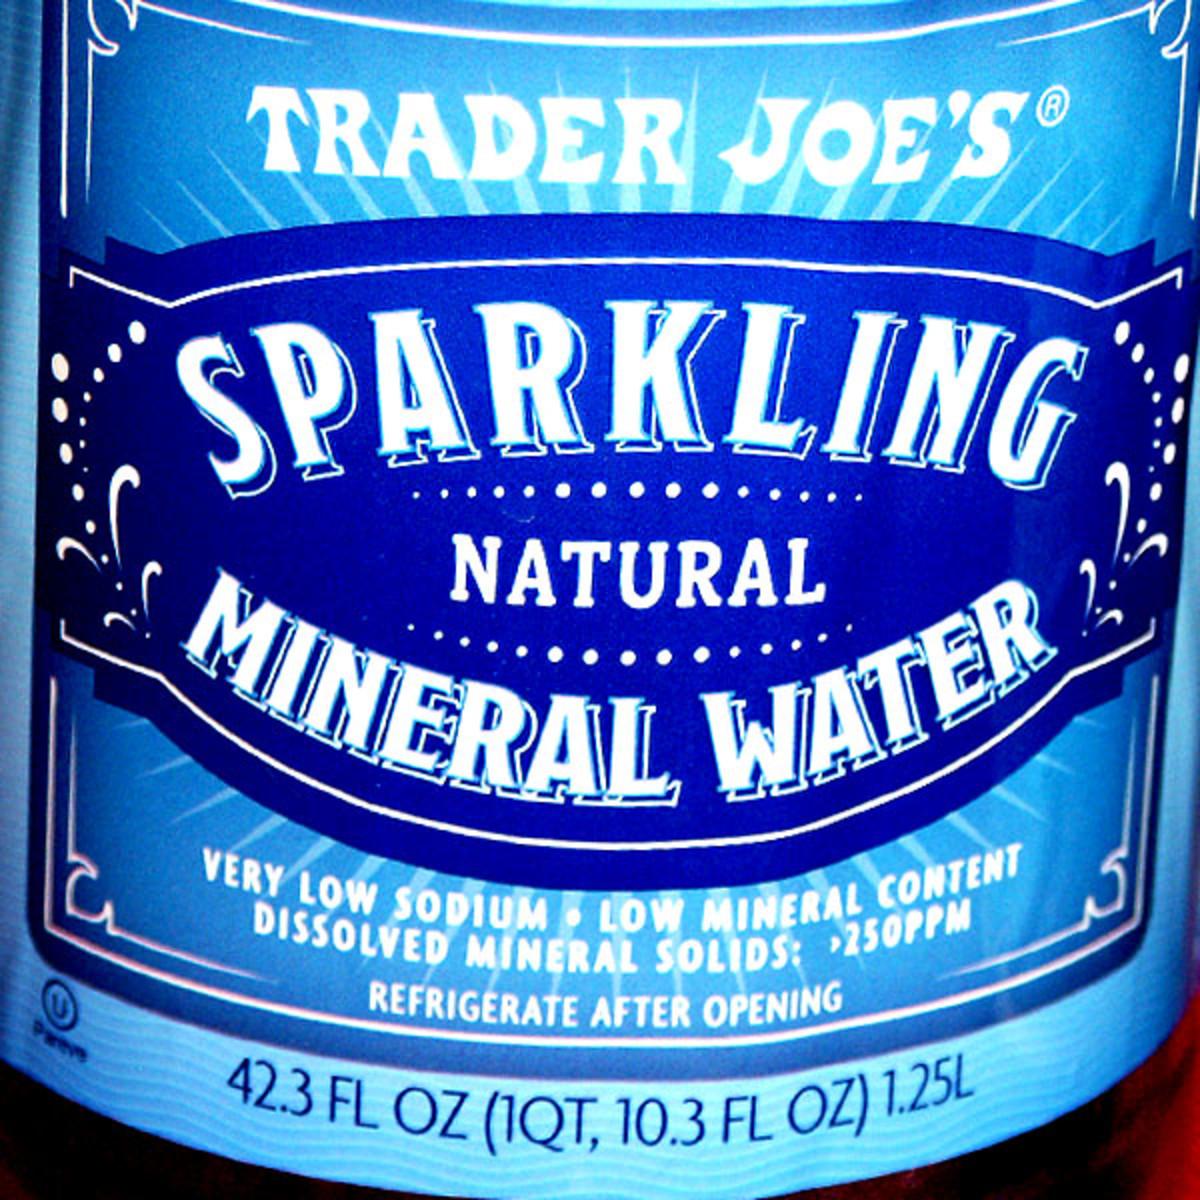 Trader Joe's sparkling mineral water label